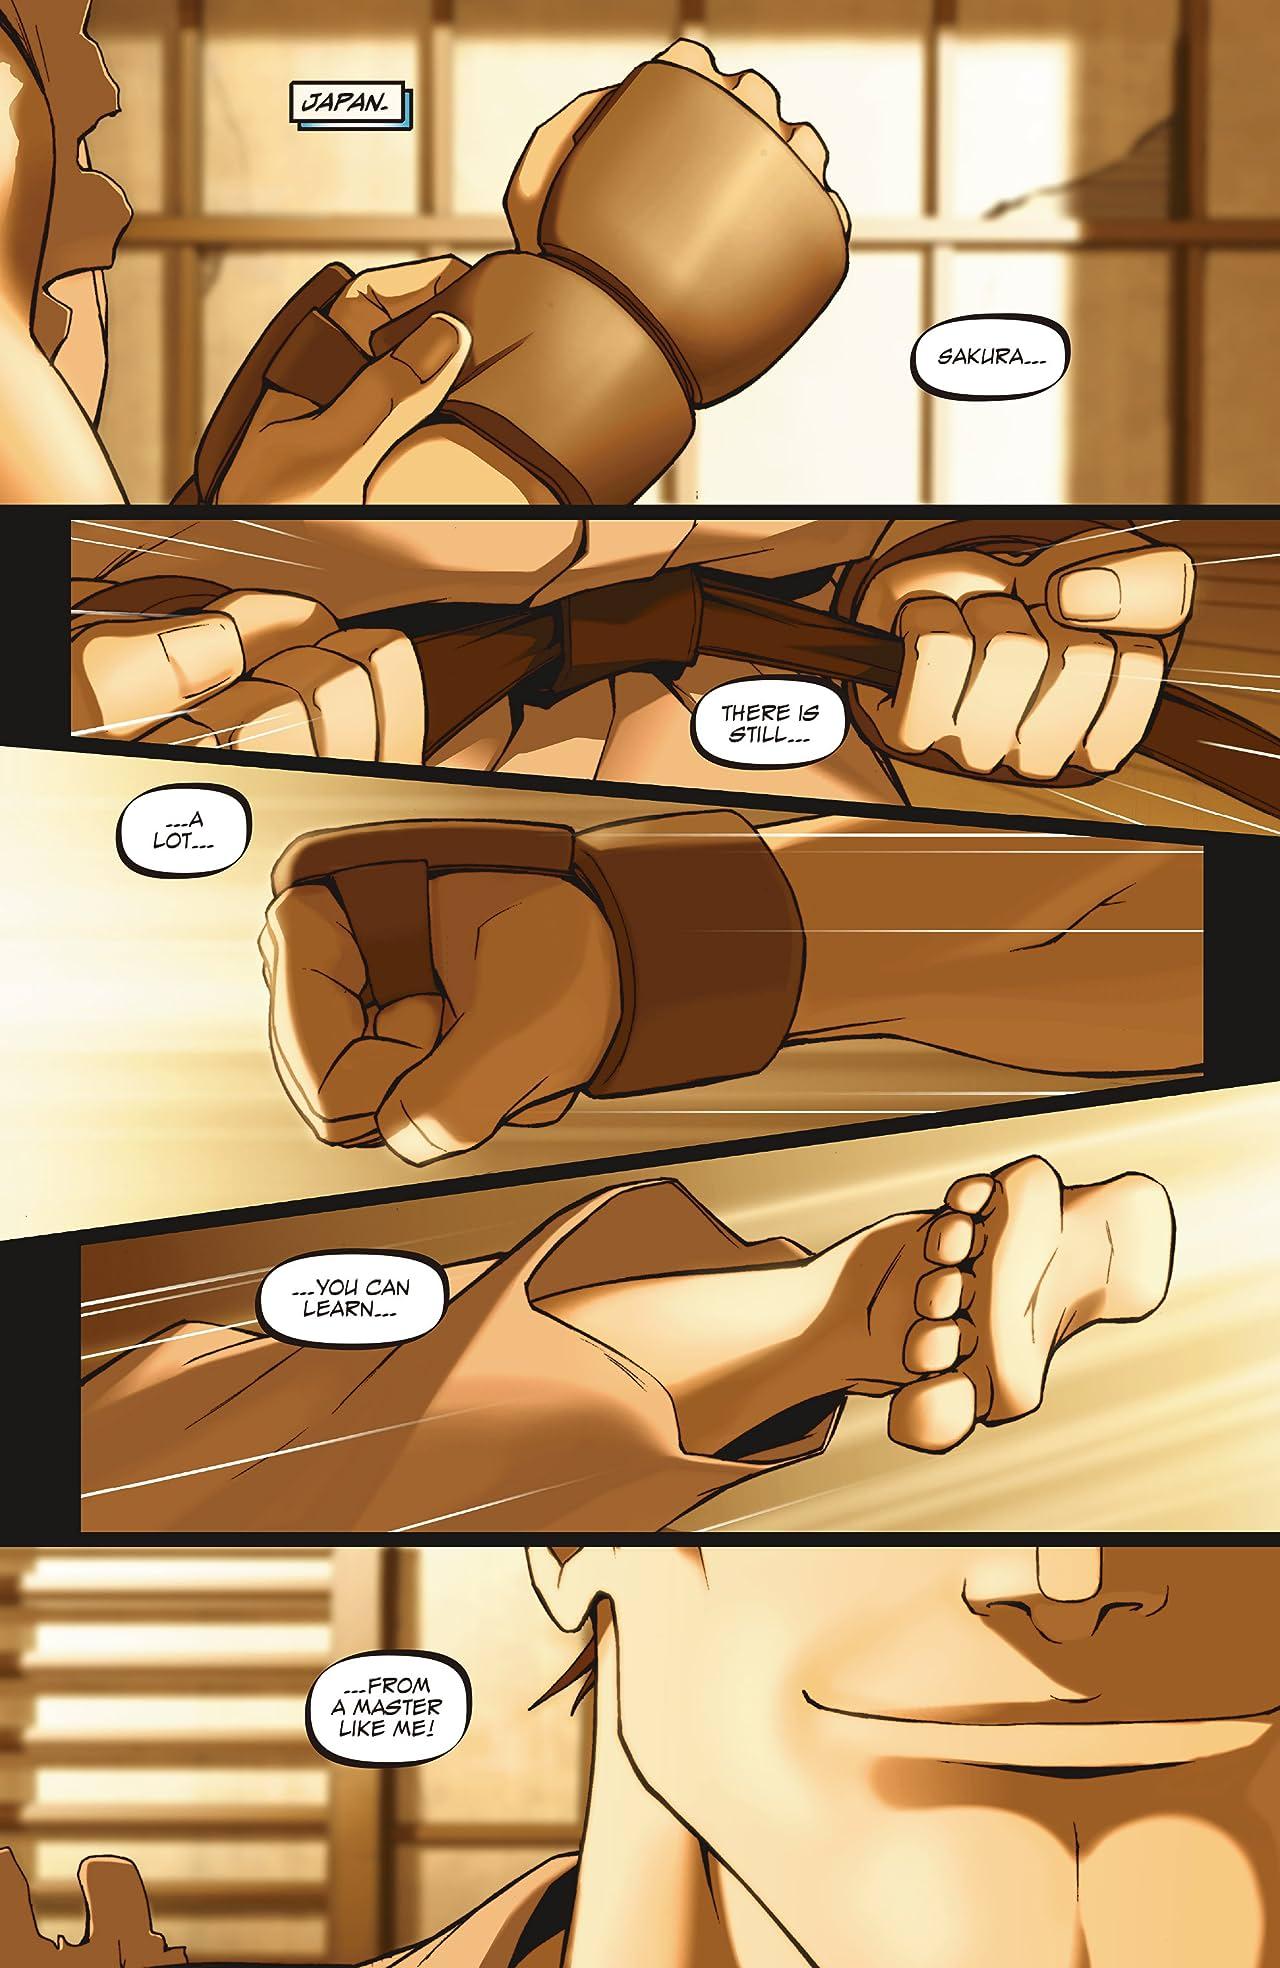 Street Fighter Legends: Sakura #1 (of 4)